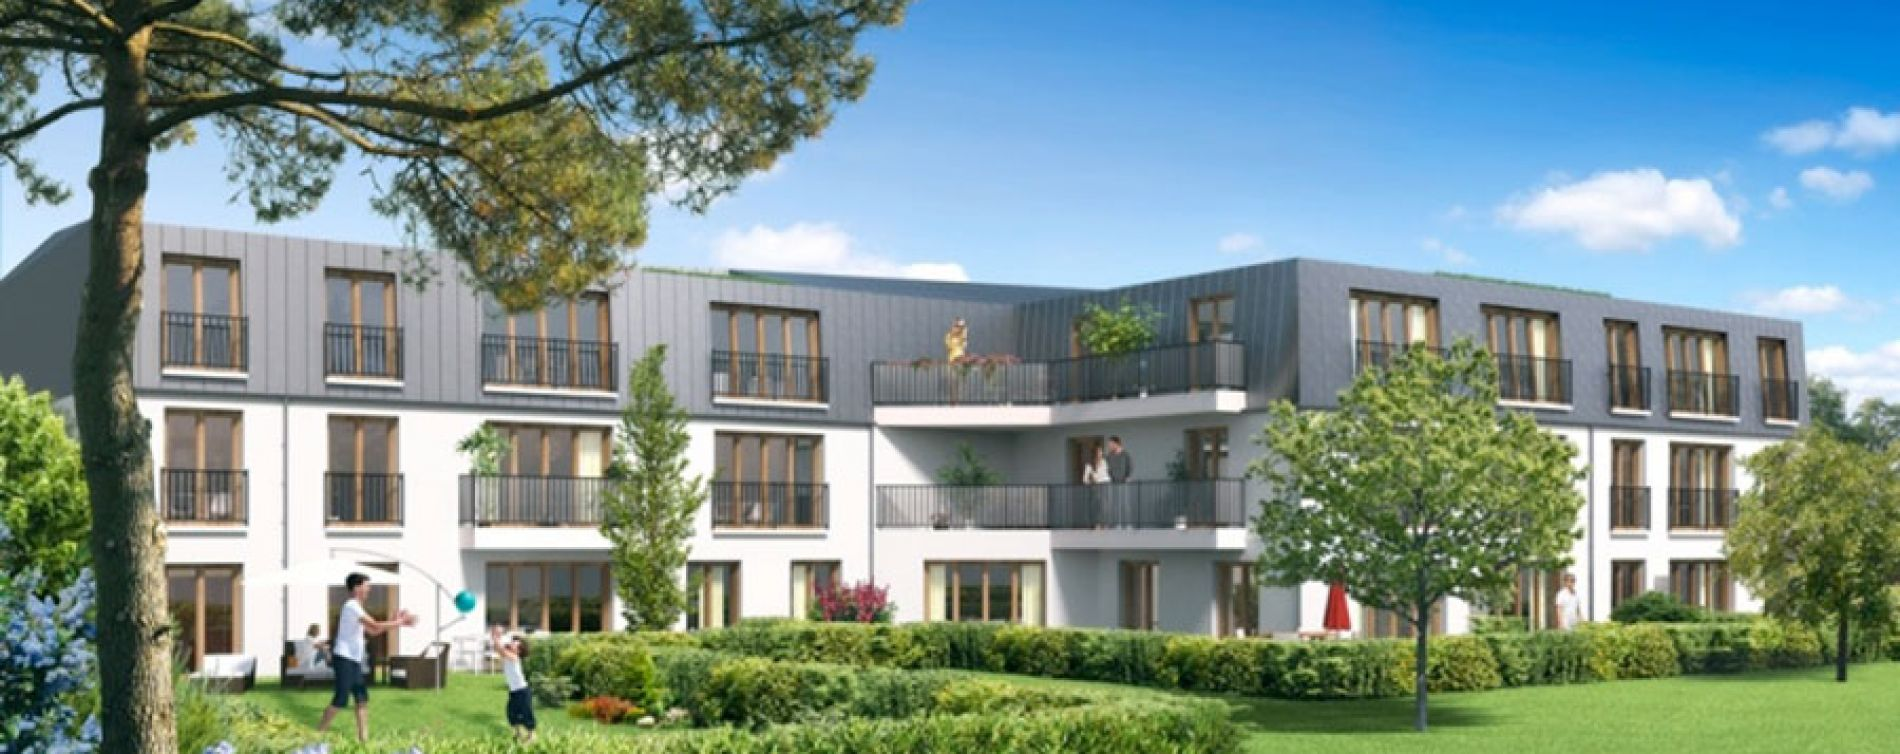 villa 125 rosny sous bois programme immobilier neuf n. Black Bedroom Furniture Sets. Home Design Ideas